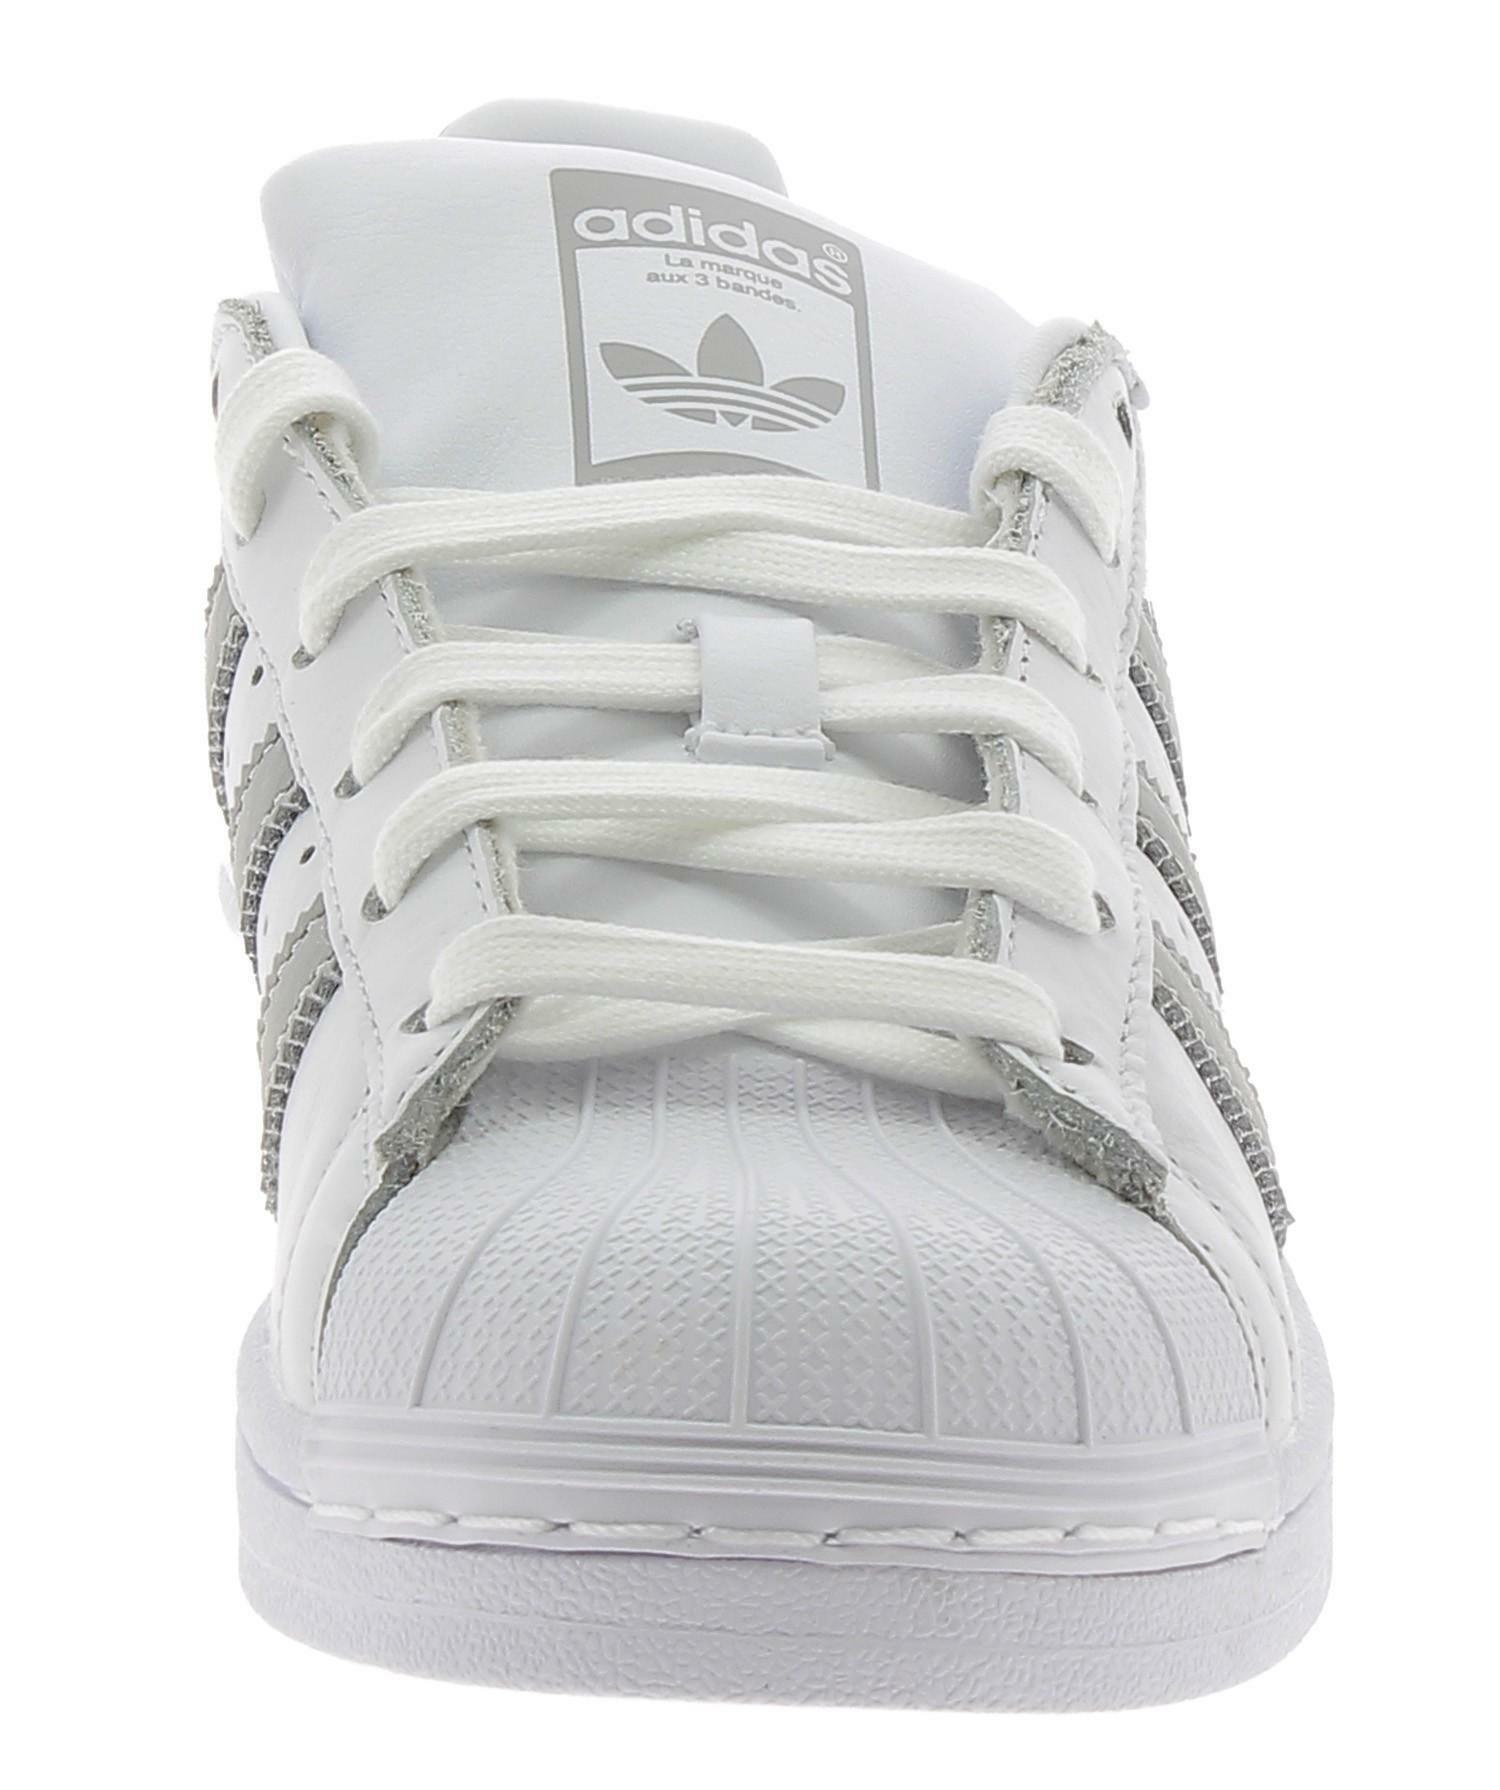 adidas adidas superstar w scarpe sportive donna bianche b42002